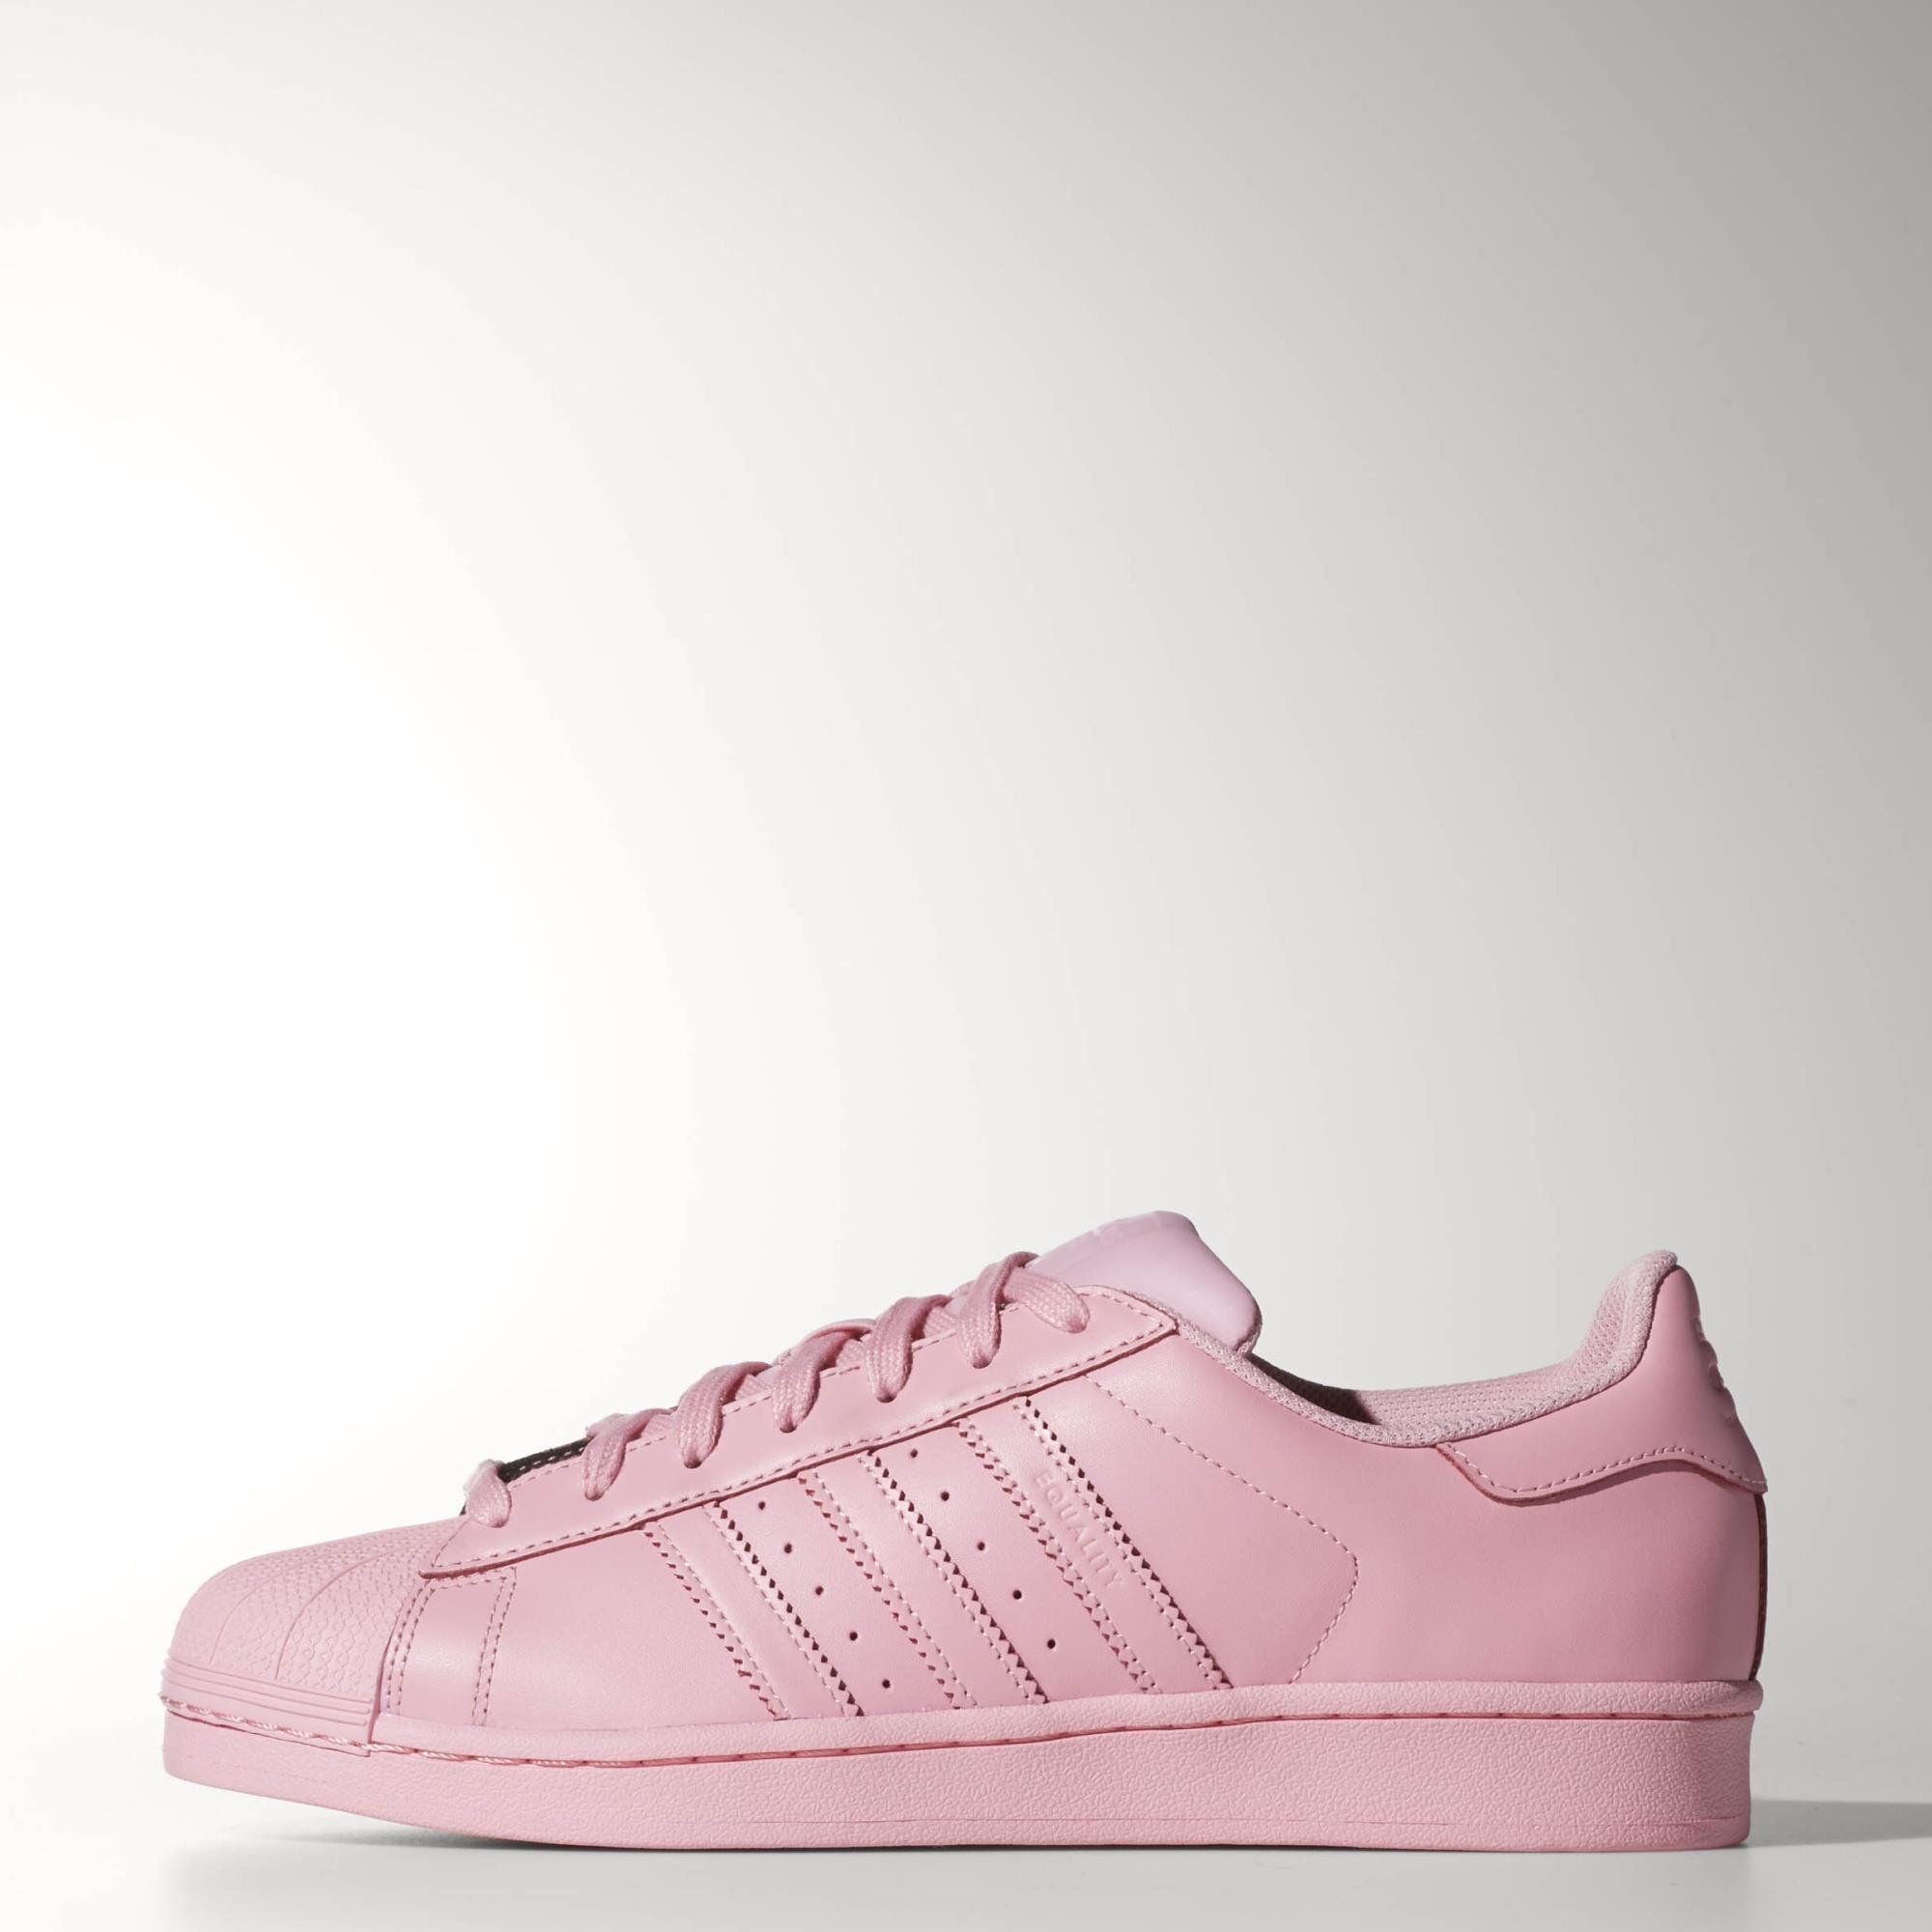 damen adidas Superstar Supercolor Pack Schuh Grau | adidas